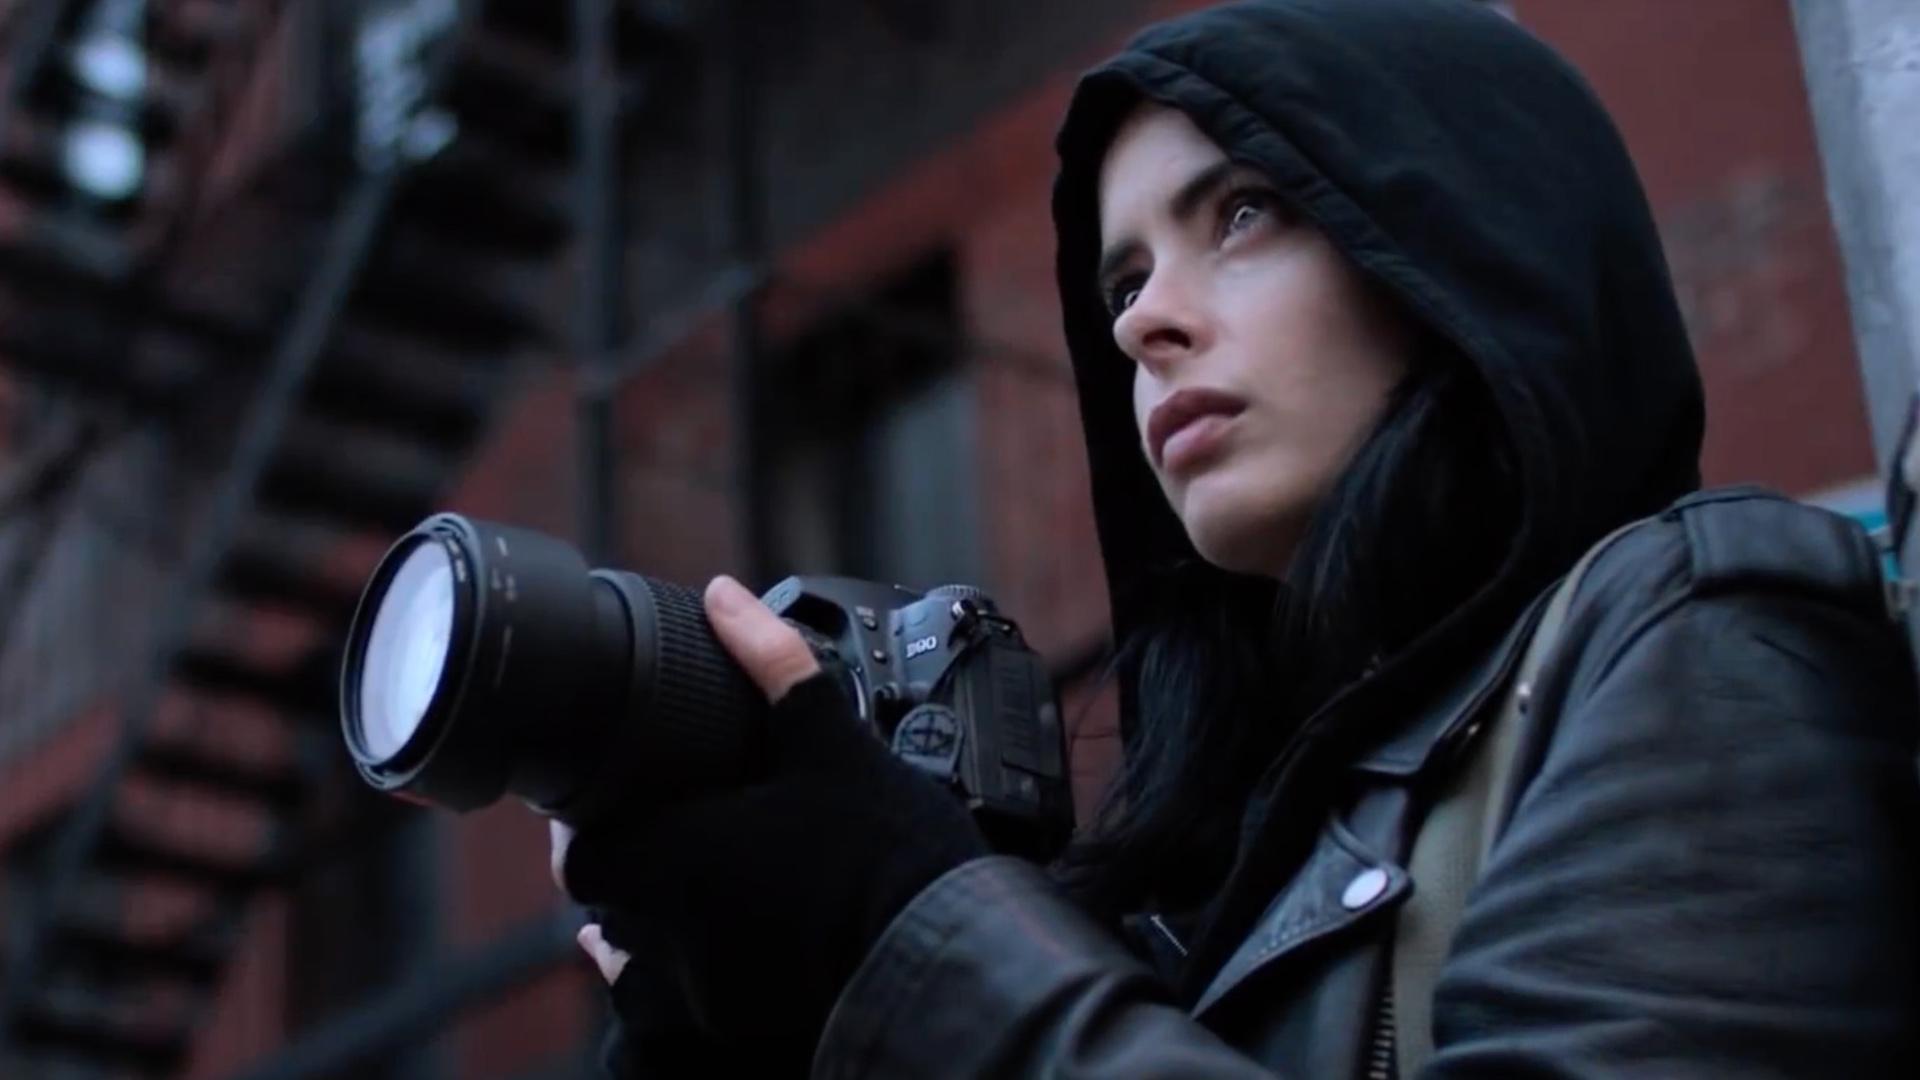 krysten ritter will make her directorial debut with an episode of